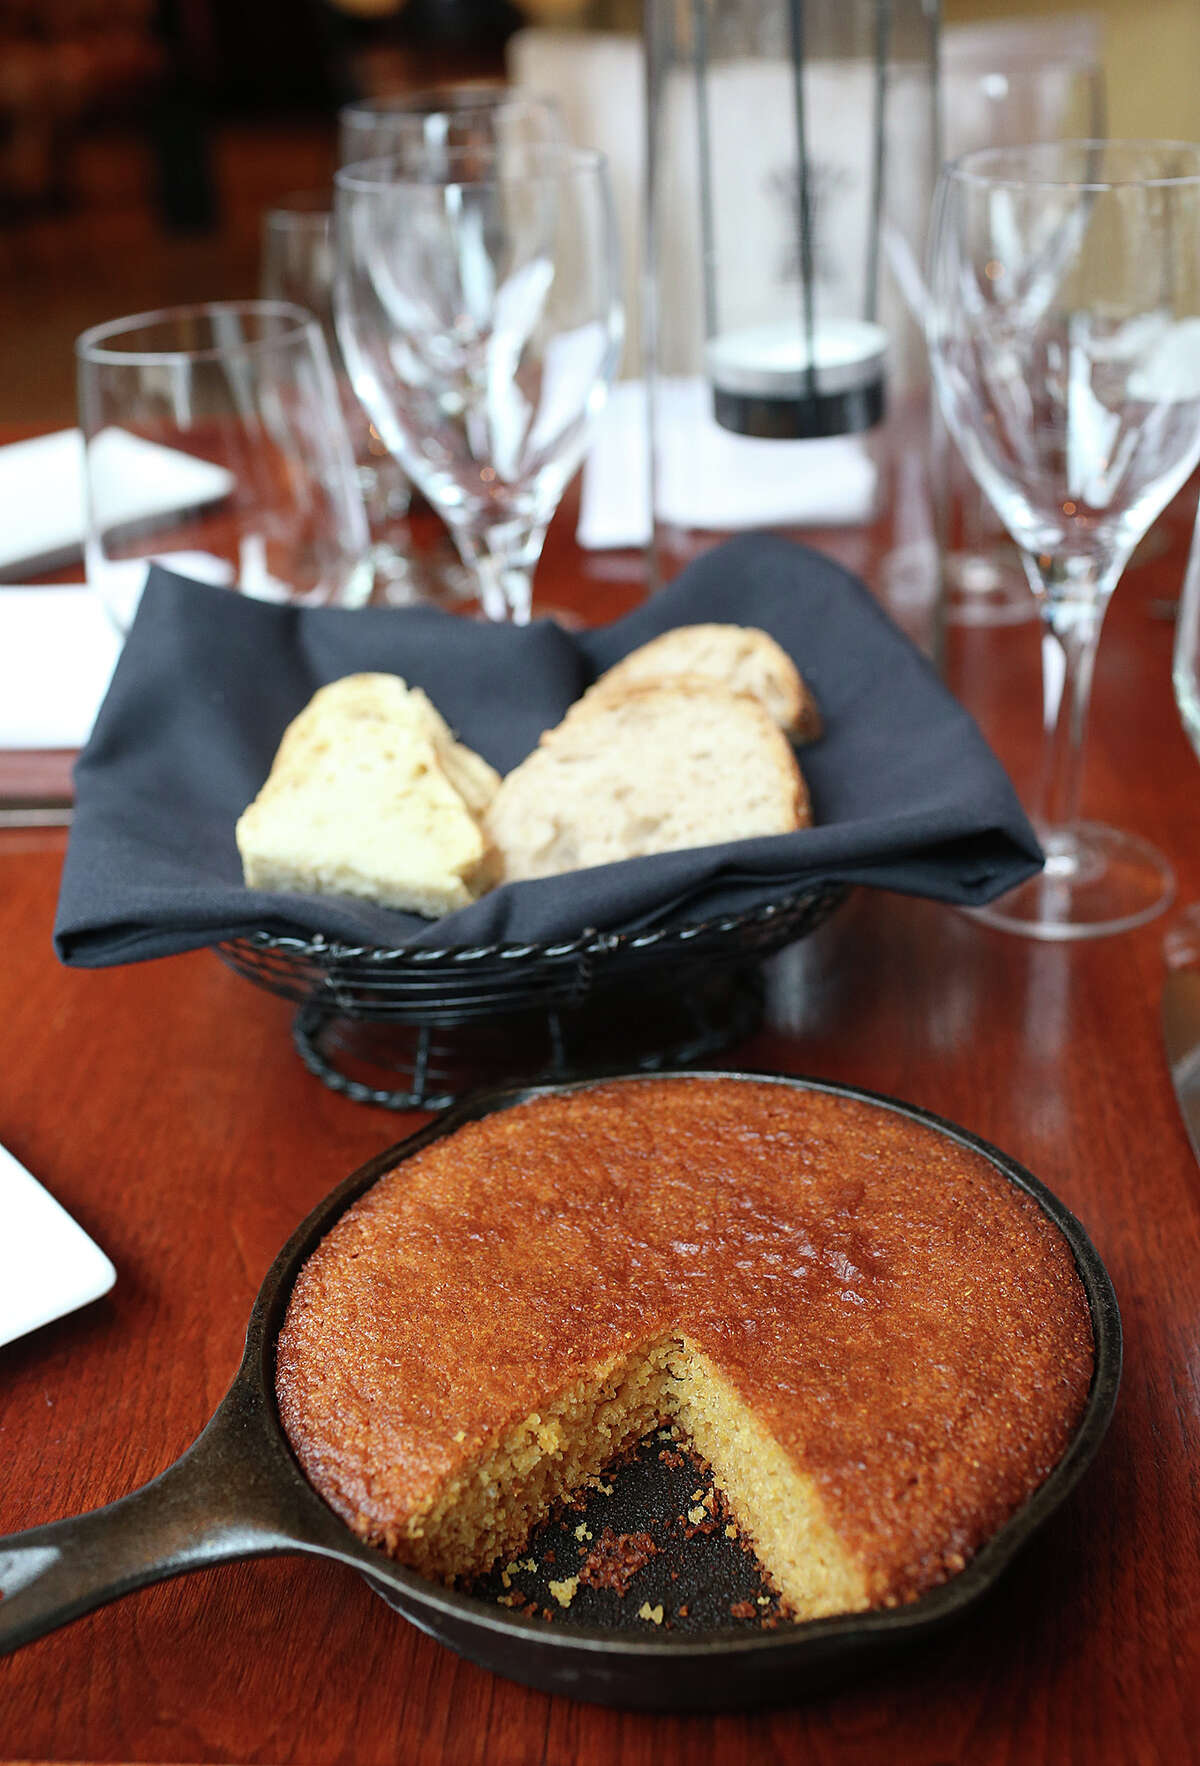 Cornbread in a cast-iron pan